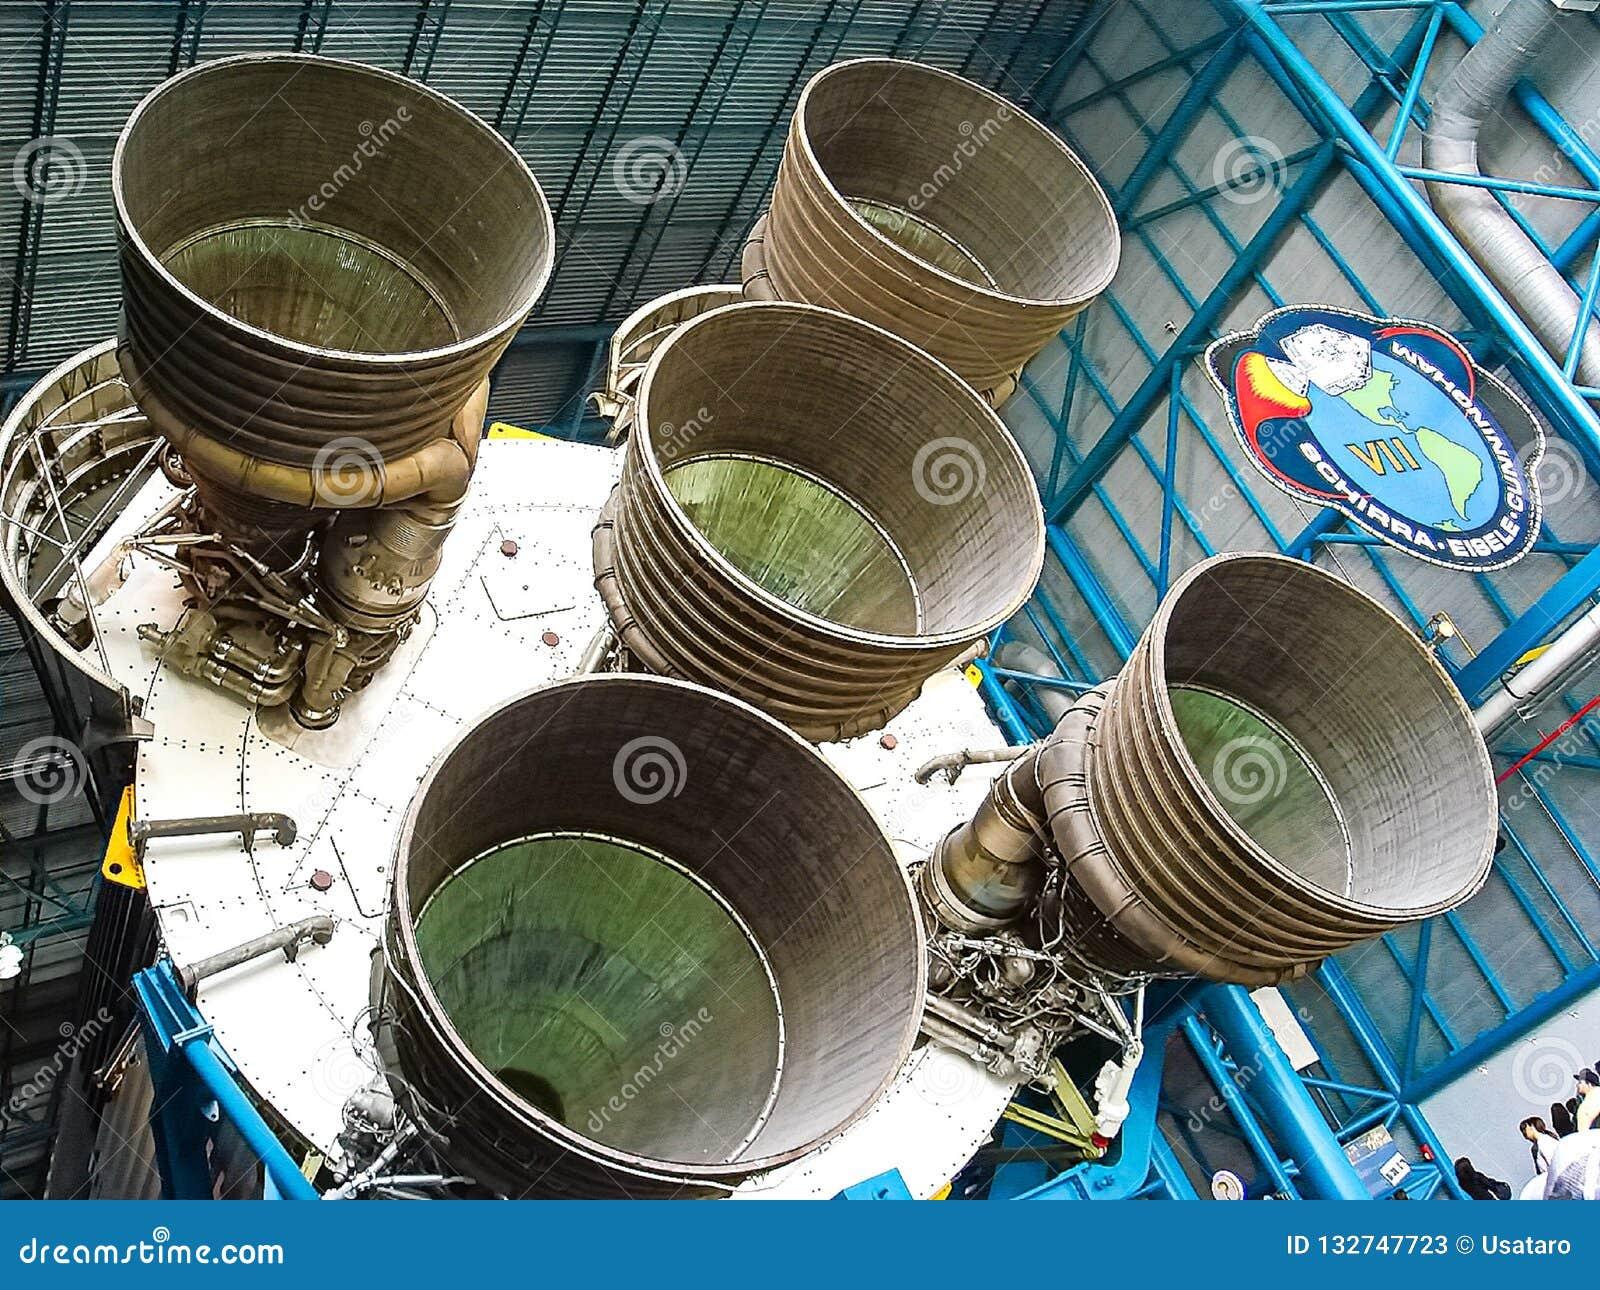 Saturn V Rocket Engines in Apollo Saturn V Centrum wordt getoond dat